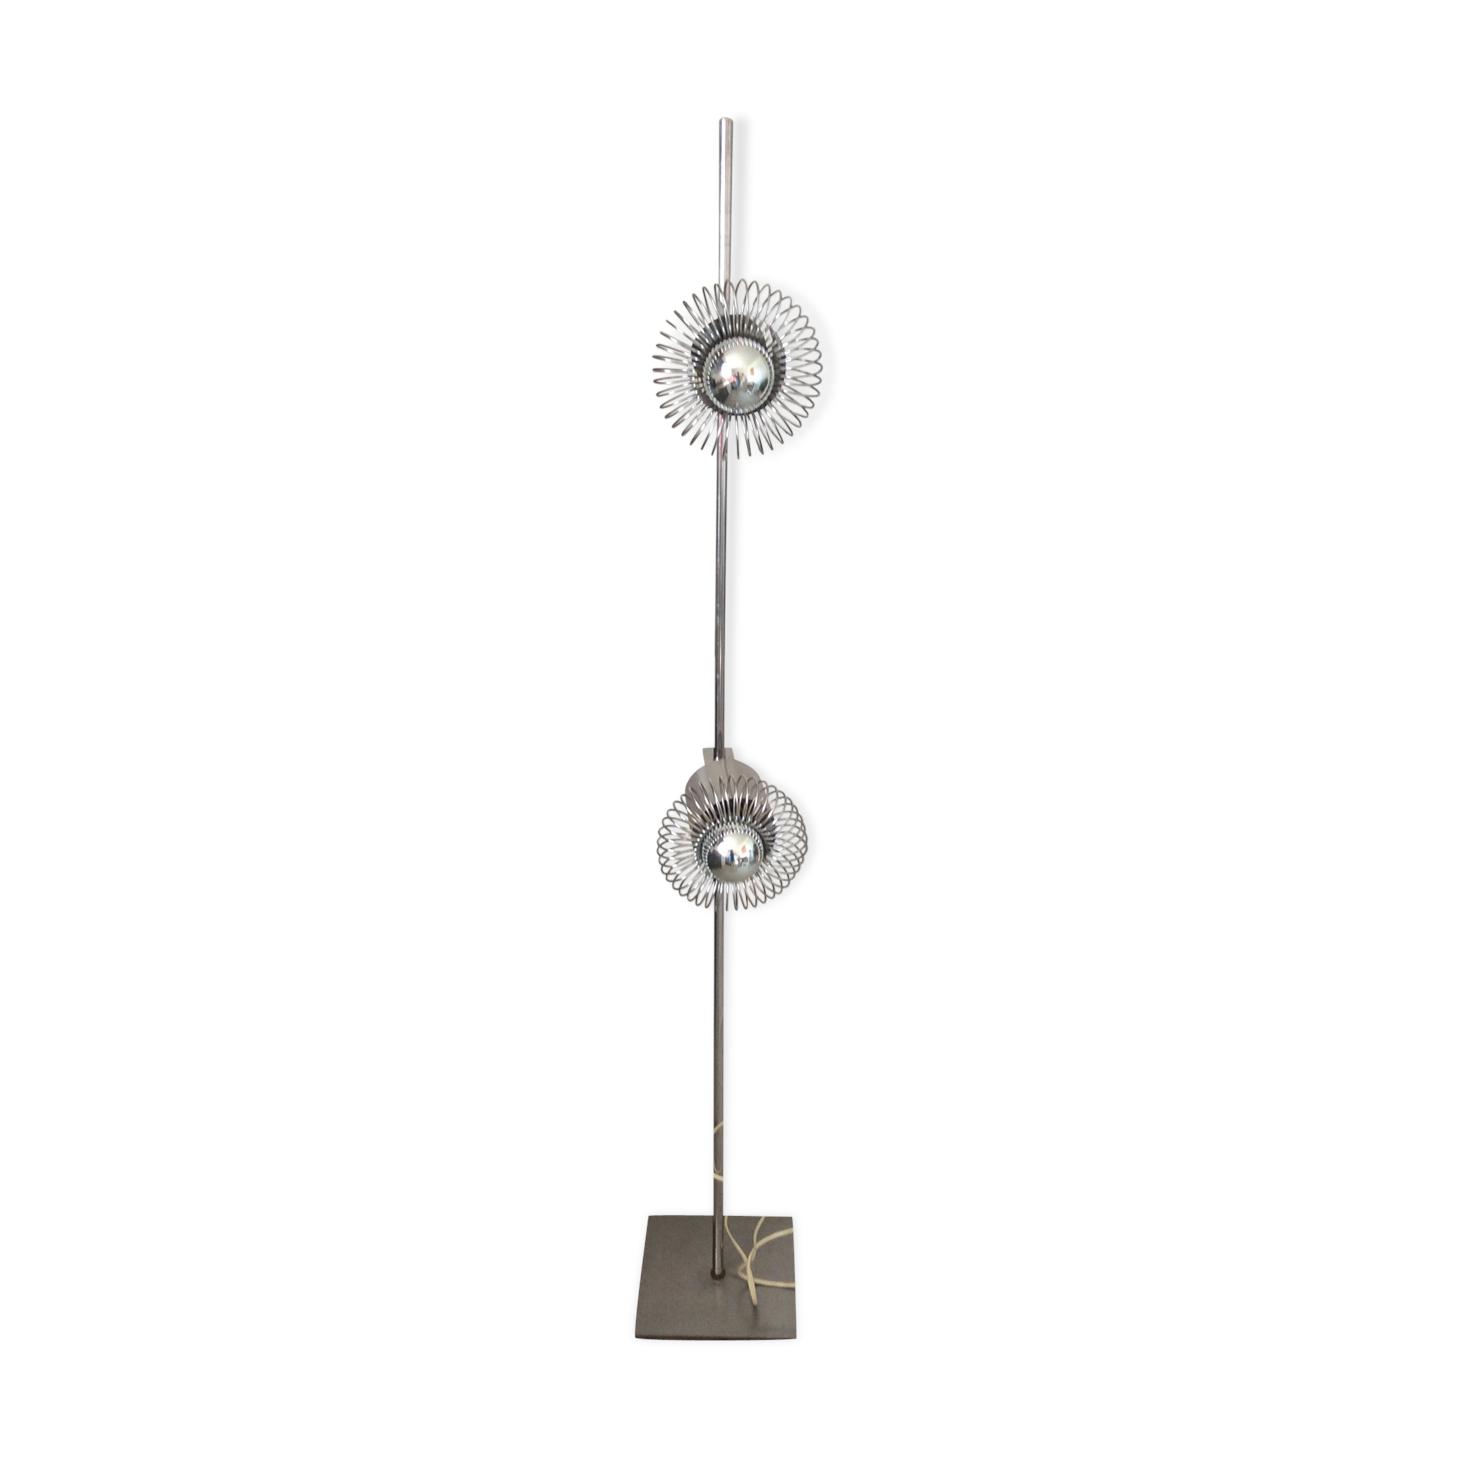 %name Résultat Supérieur 15 Luxe Lampadaire Inox Design Galerie 2017 Pkt6